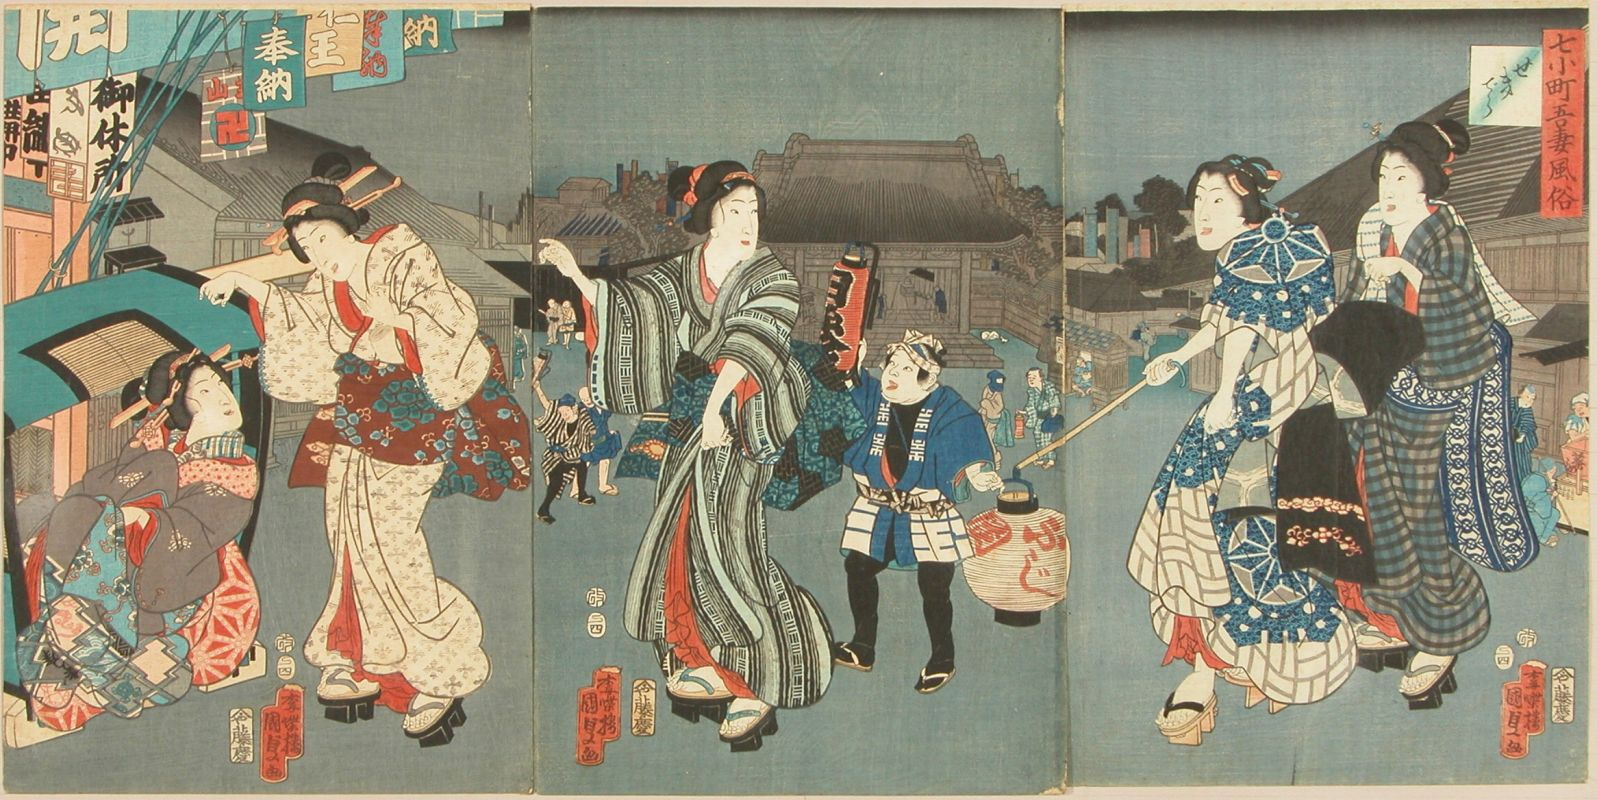 KUNISADA II <i>Sekider</i>a (Komachi at the Barrier Temple), from <i>Nana Komachi azuma fuzoku</i> (Parody of seven Komachi and daily life of the eastern capital)